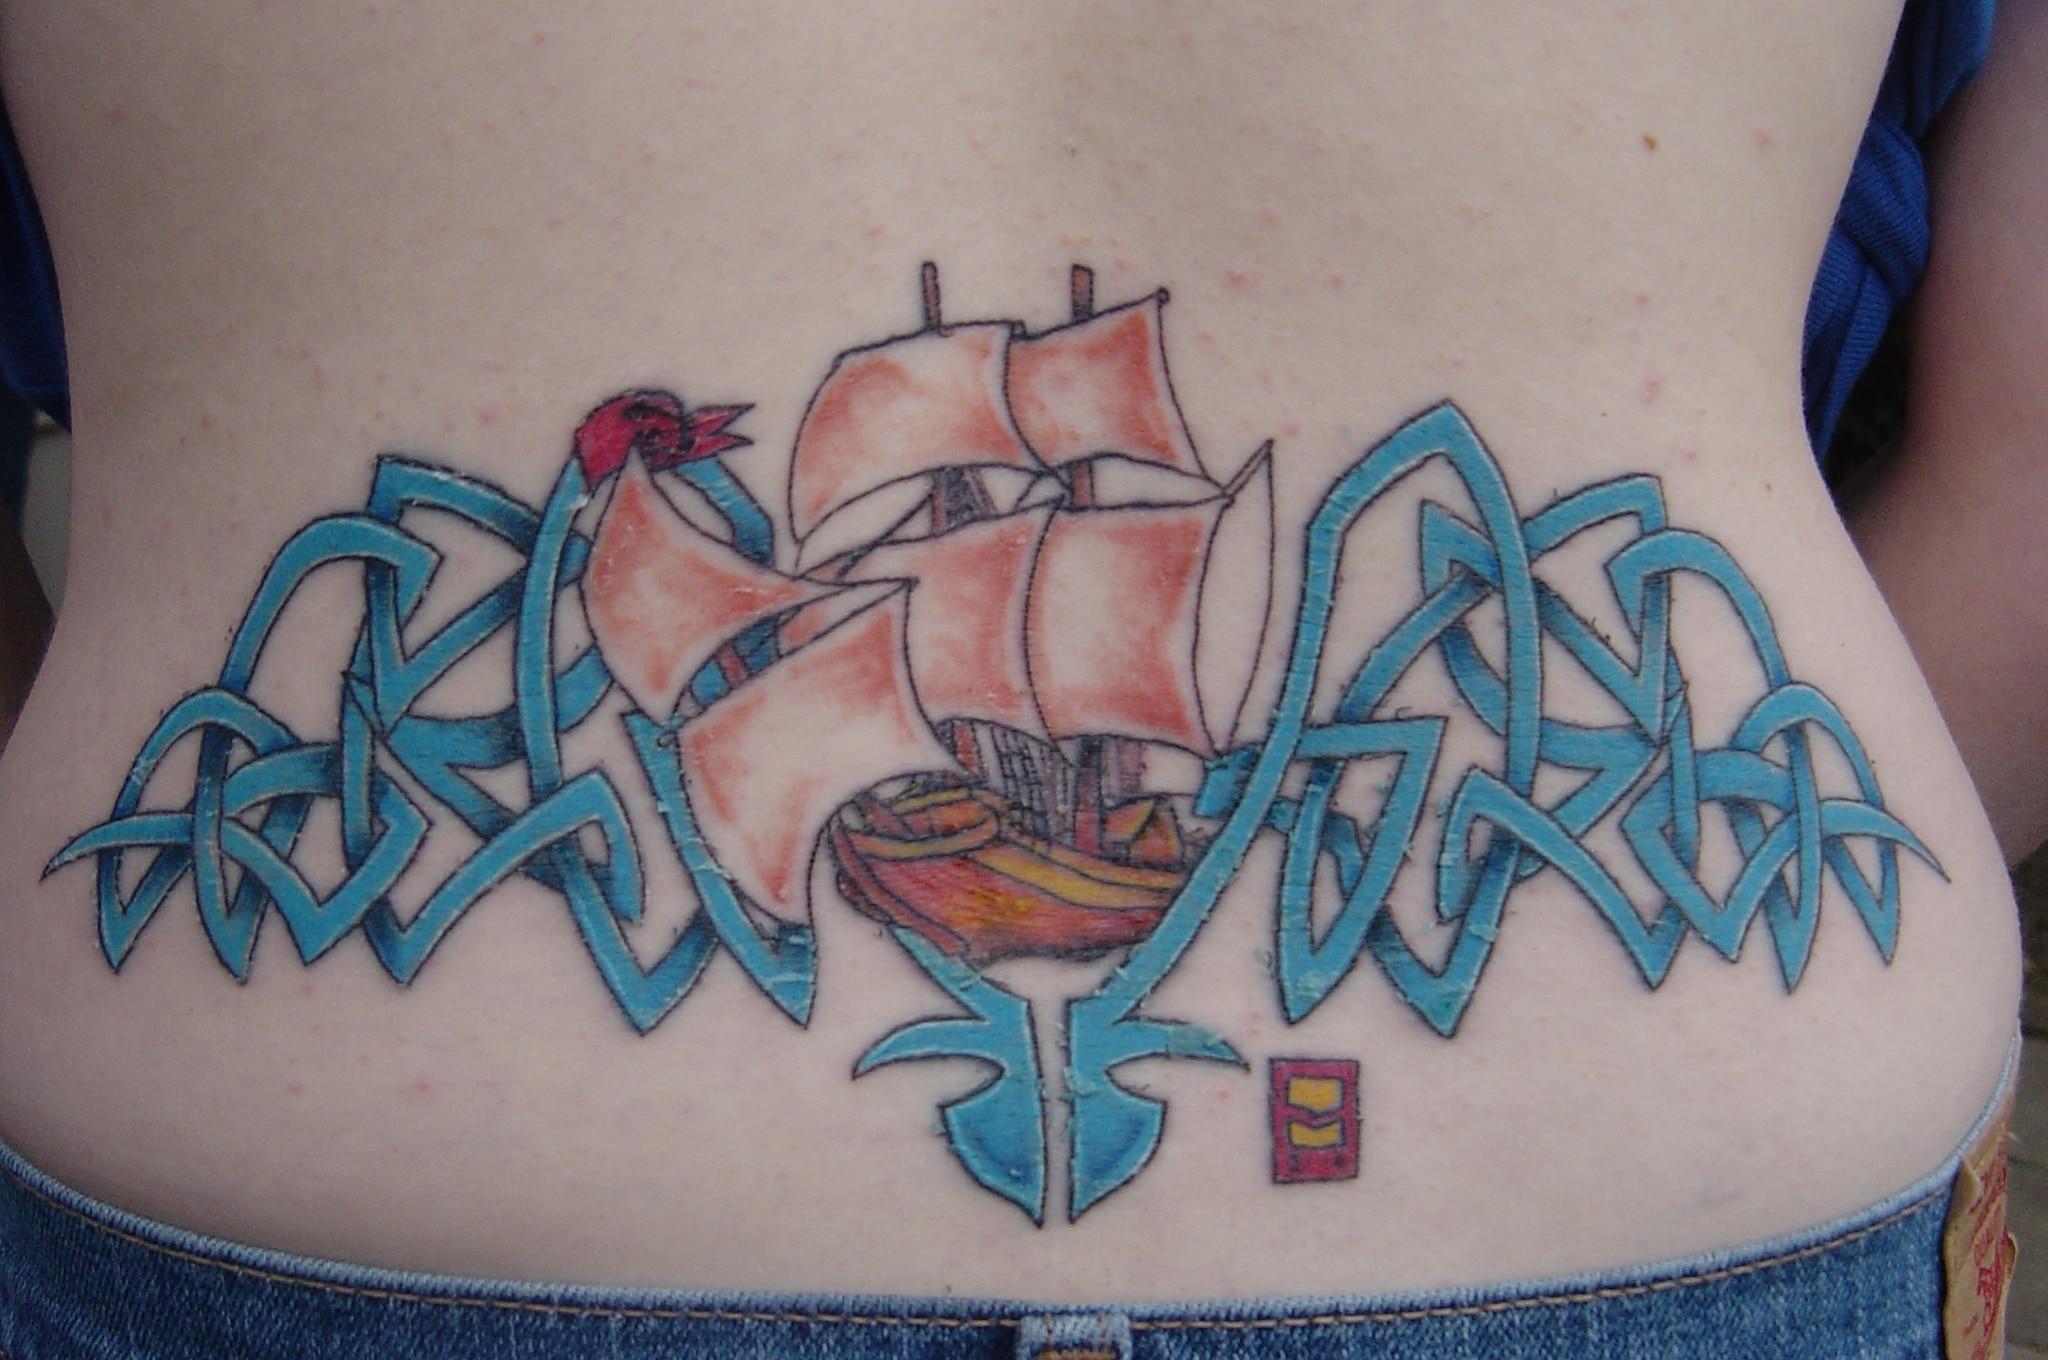 shelle_200608_ship_tattoo_2